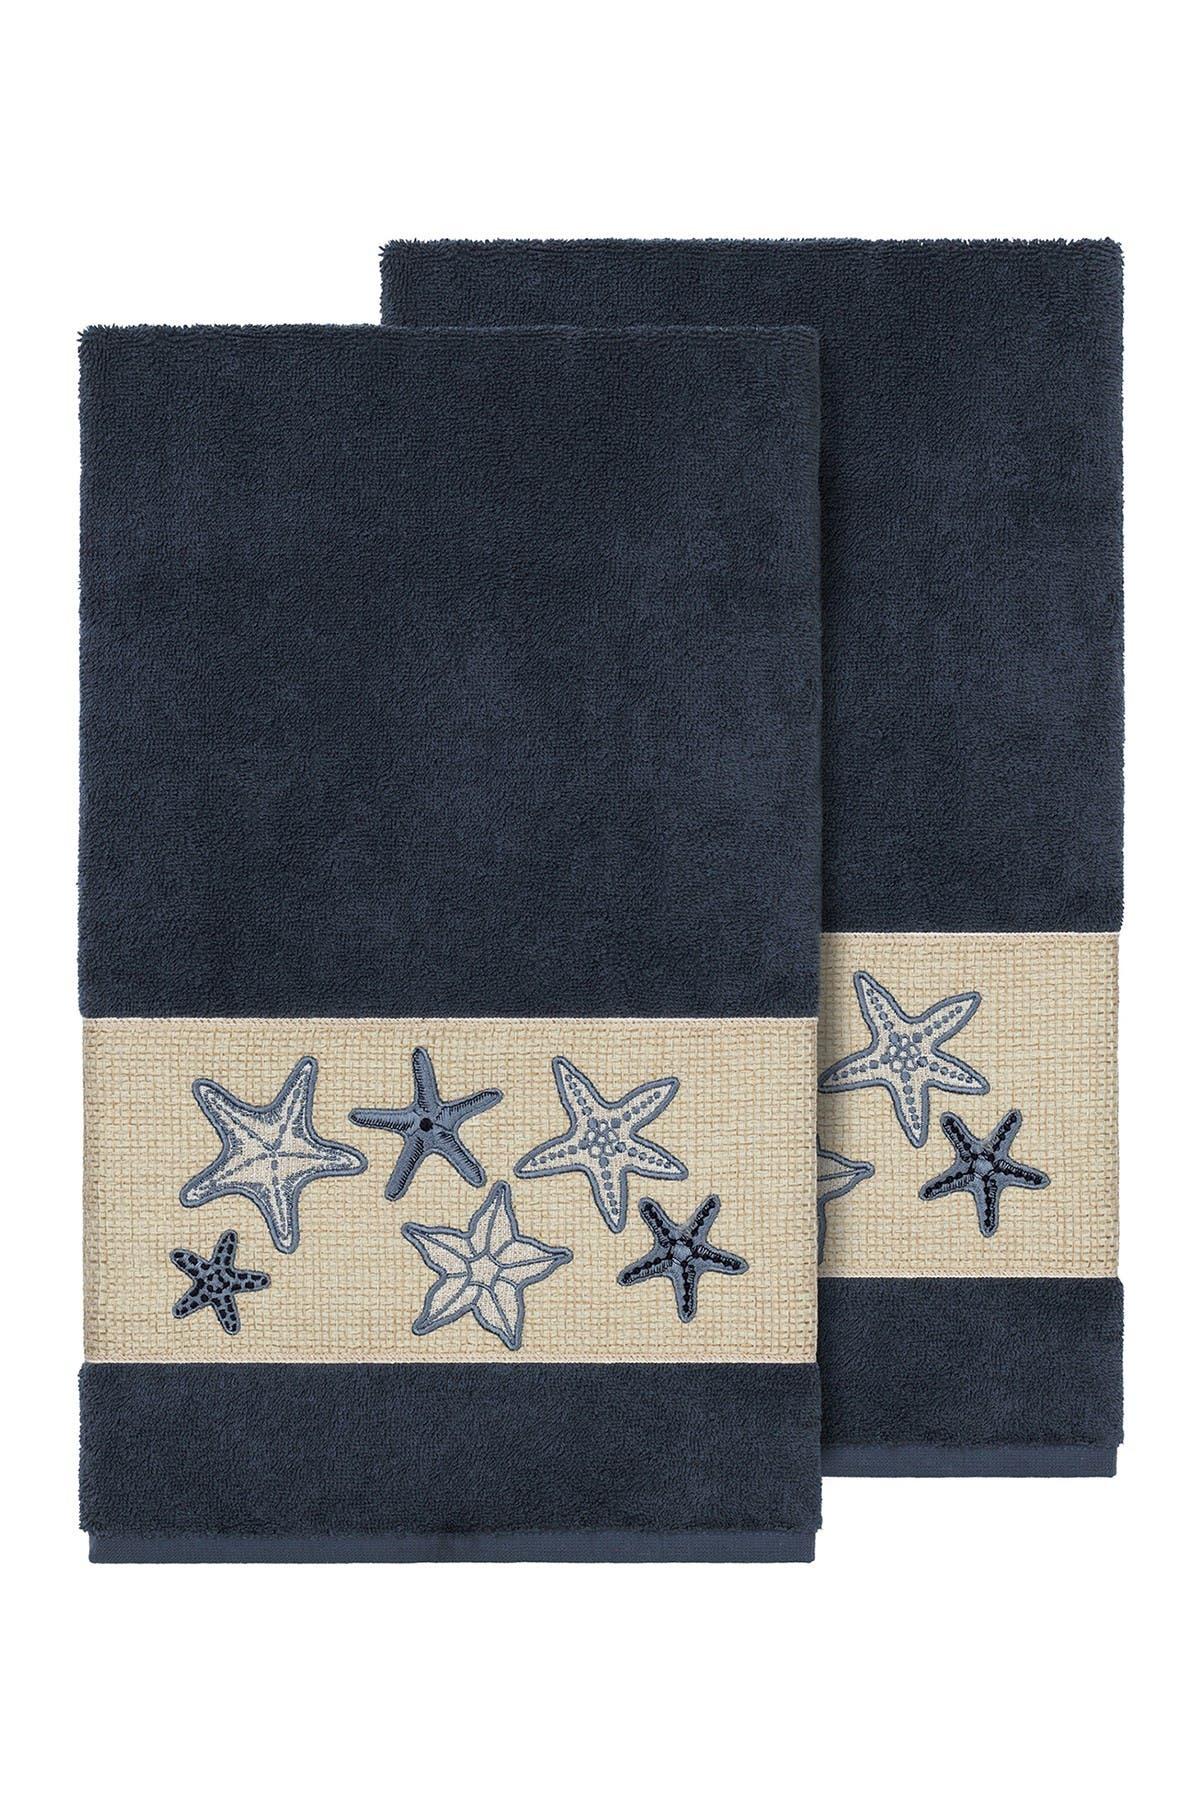 Image of LINUM HOME Lydia Embellished Bath Towel - Set of 2 - Midnight Blue